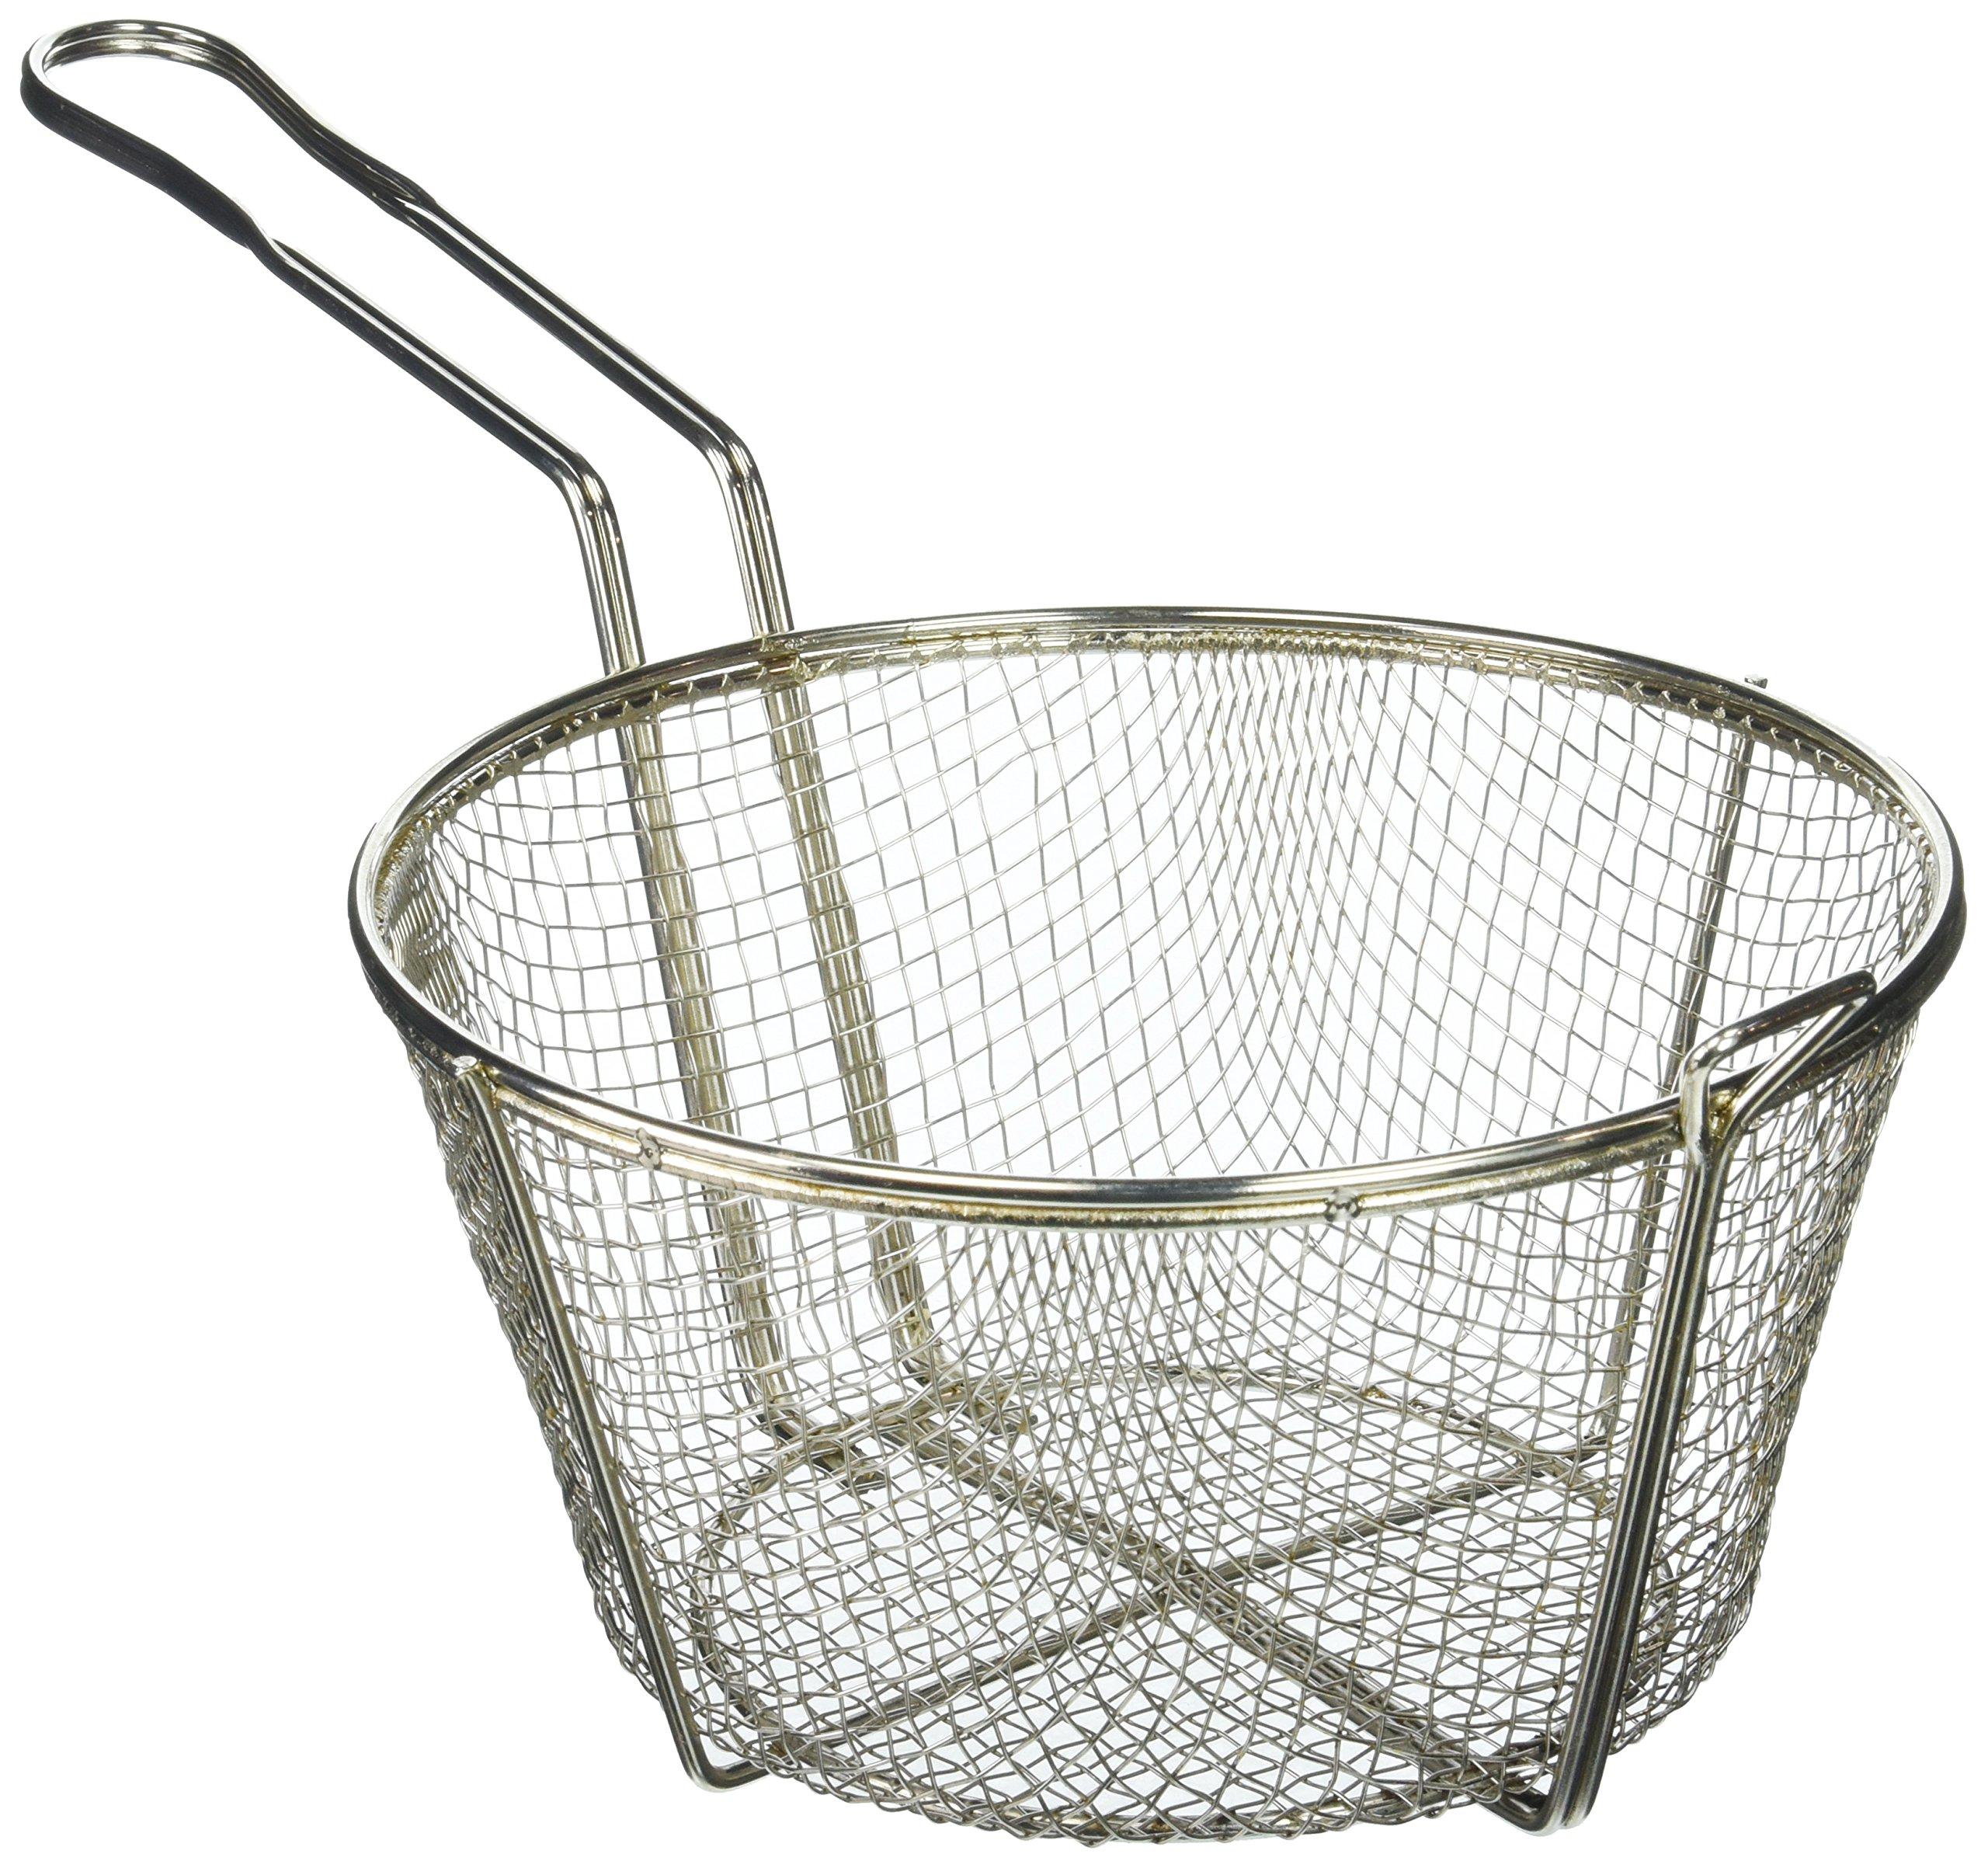 Winco FBR-9 Steel Round Wire Fry Basket, 9-Inch by Winco